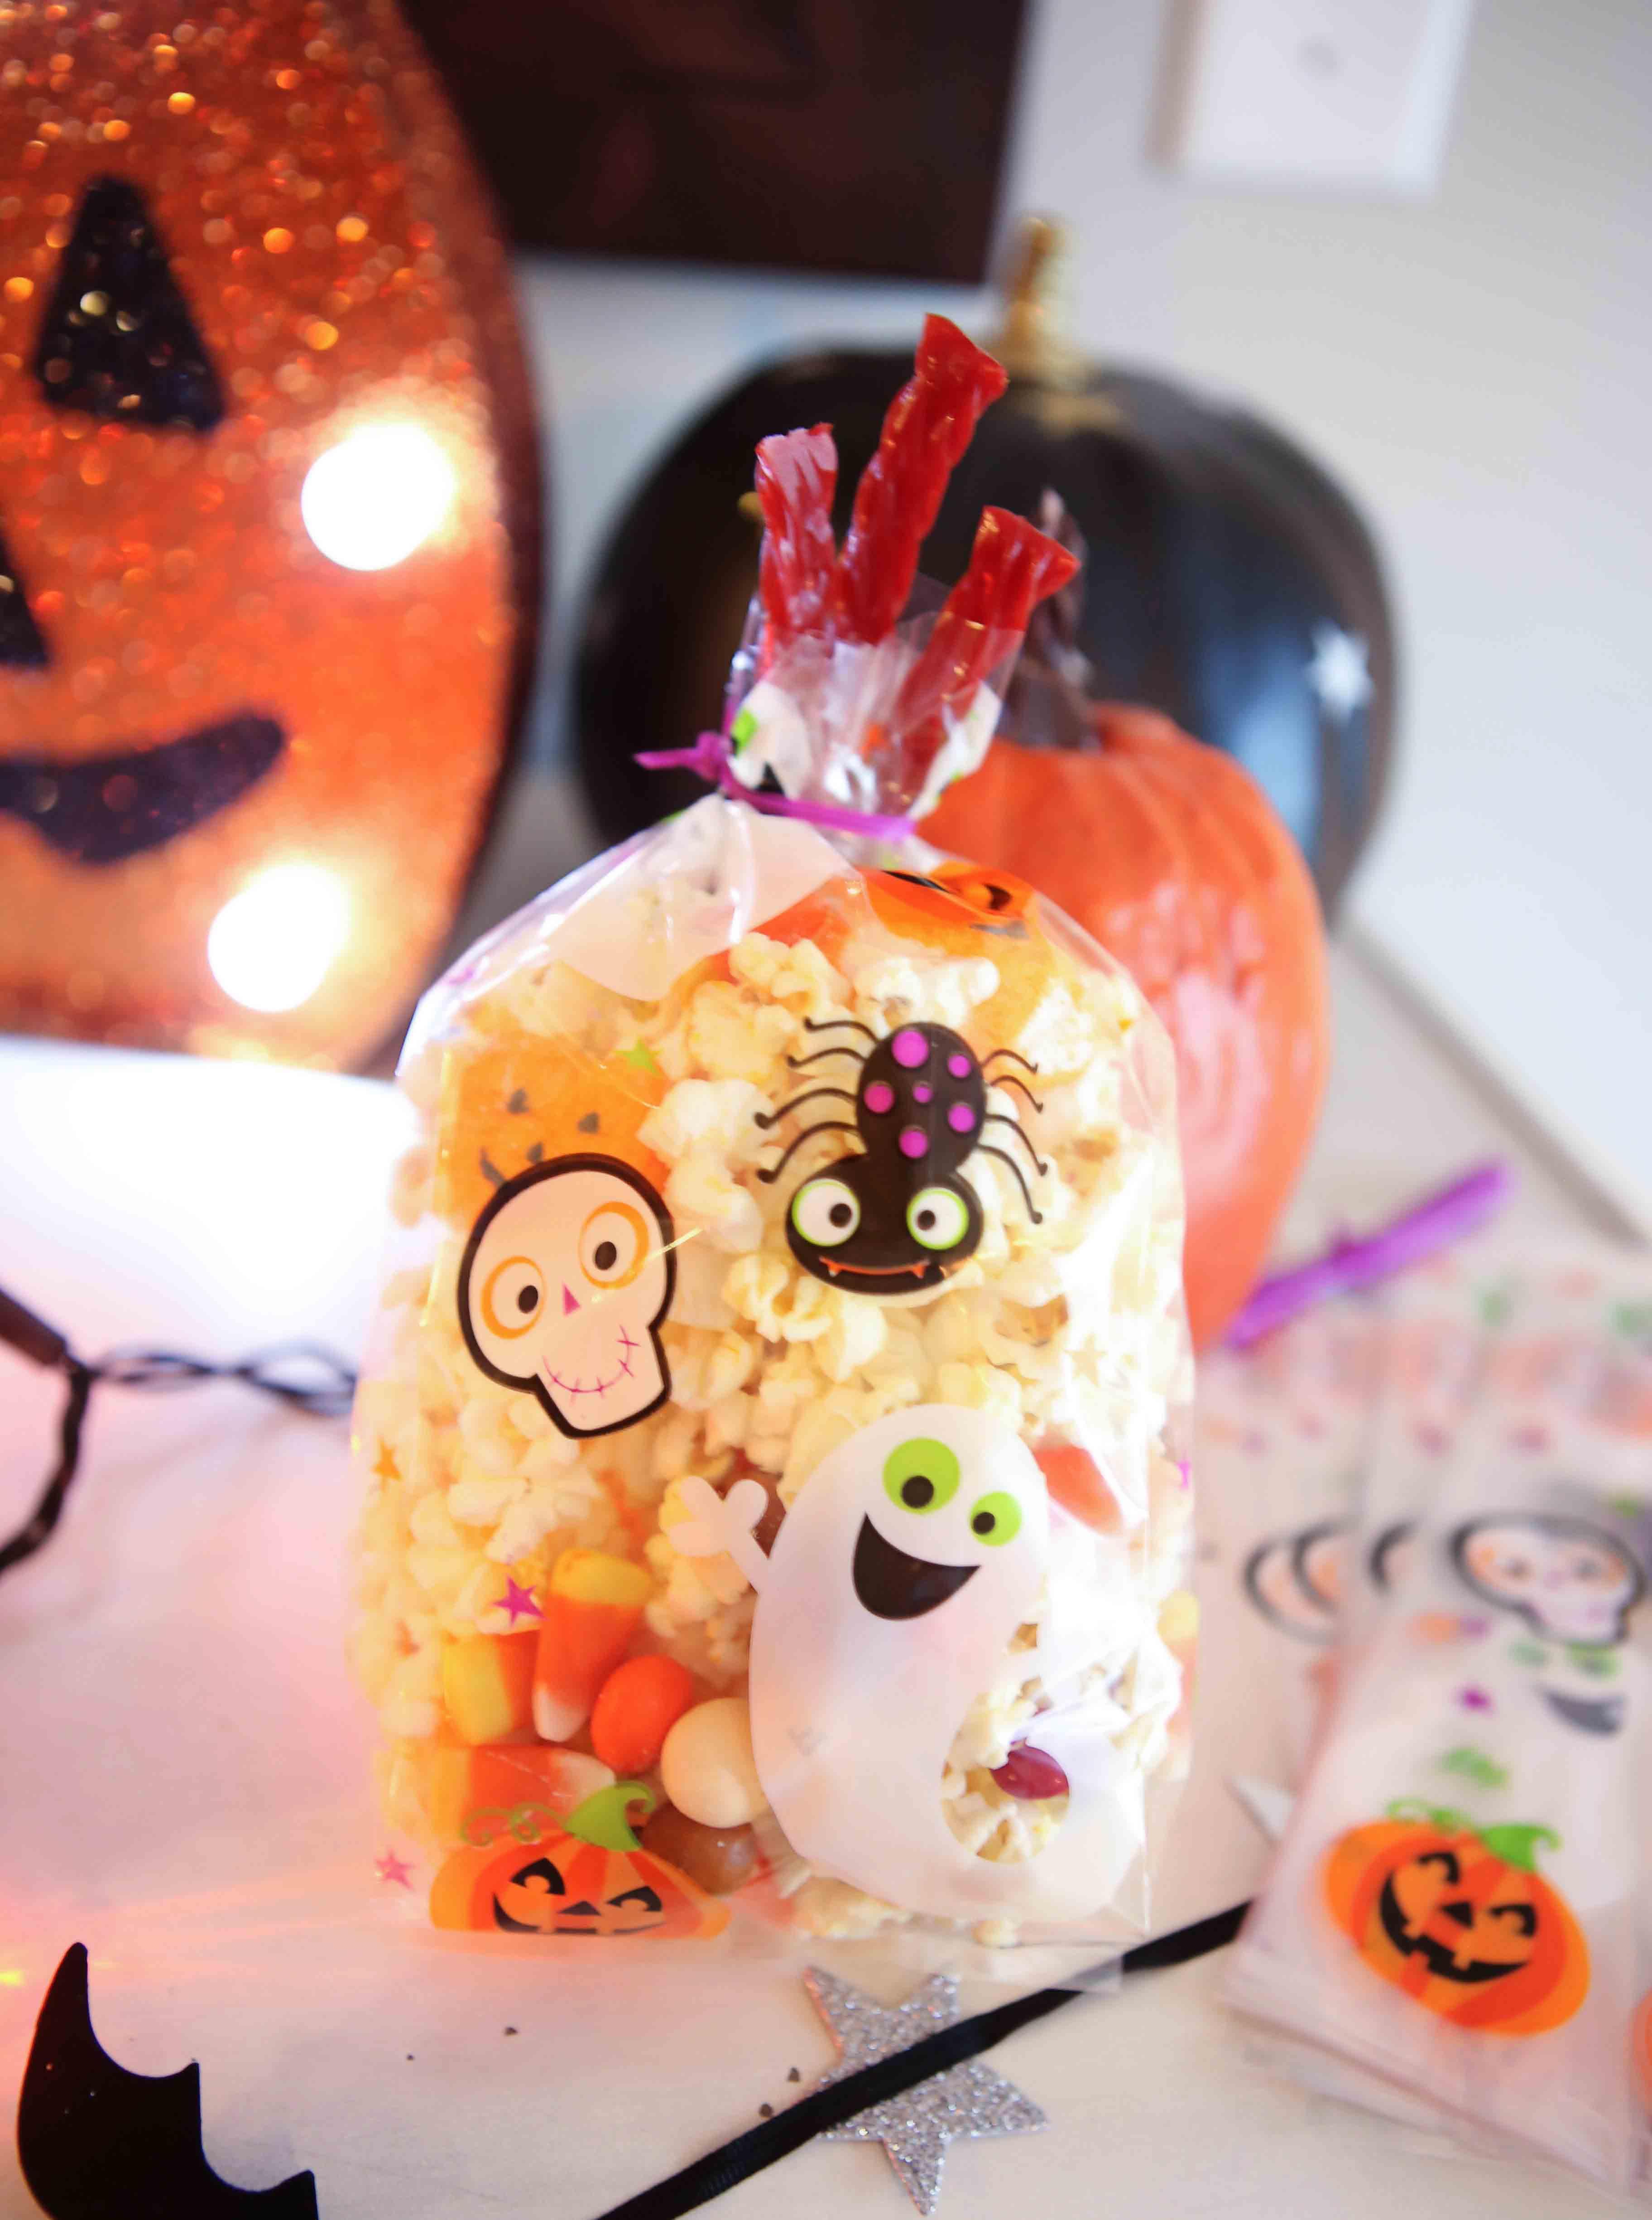 candy for popcorn bar - Halloween Popcorn Bar by Atlanta lifestyle blogger Happily Hughes